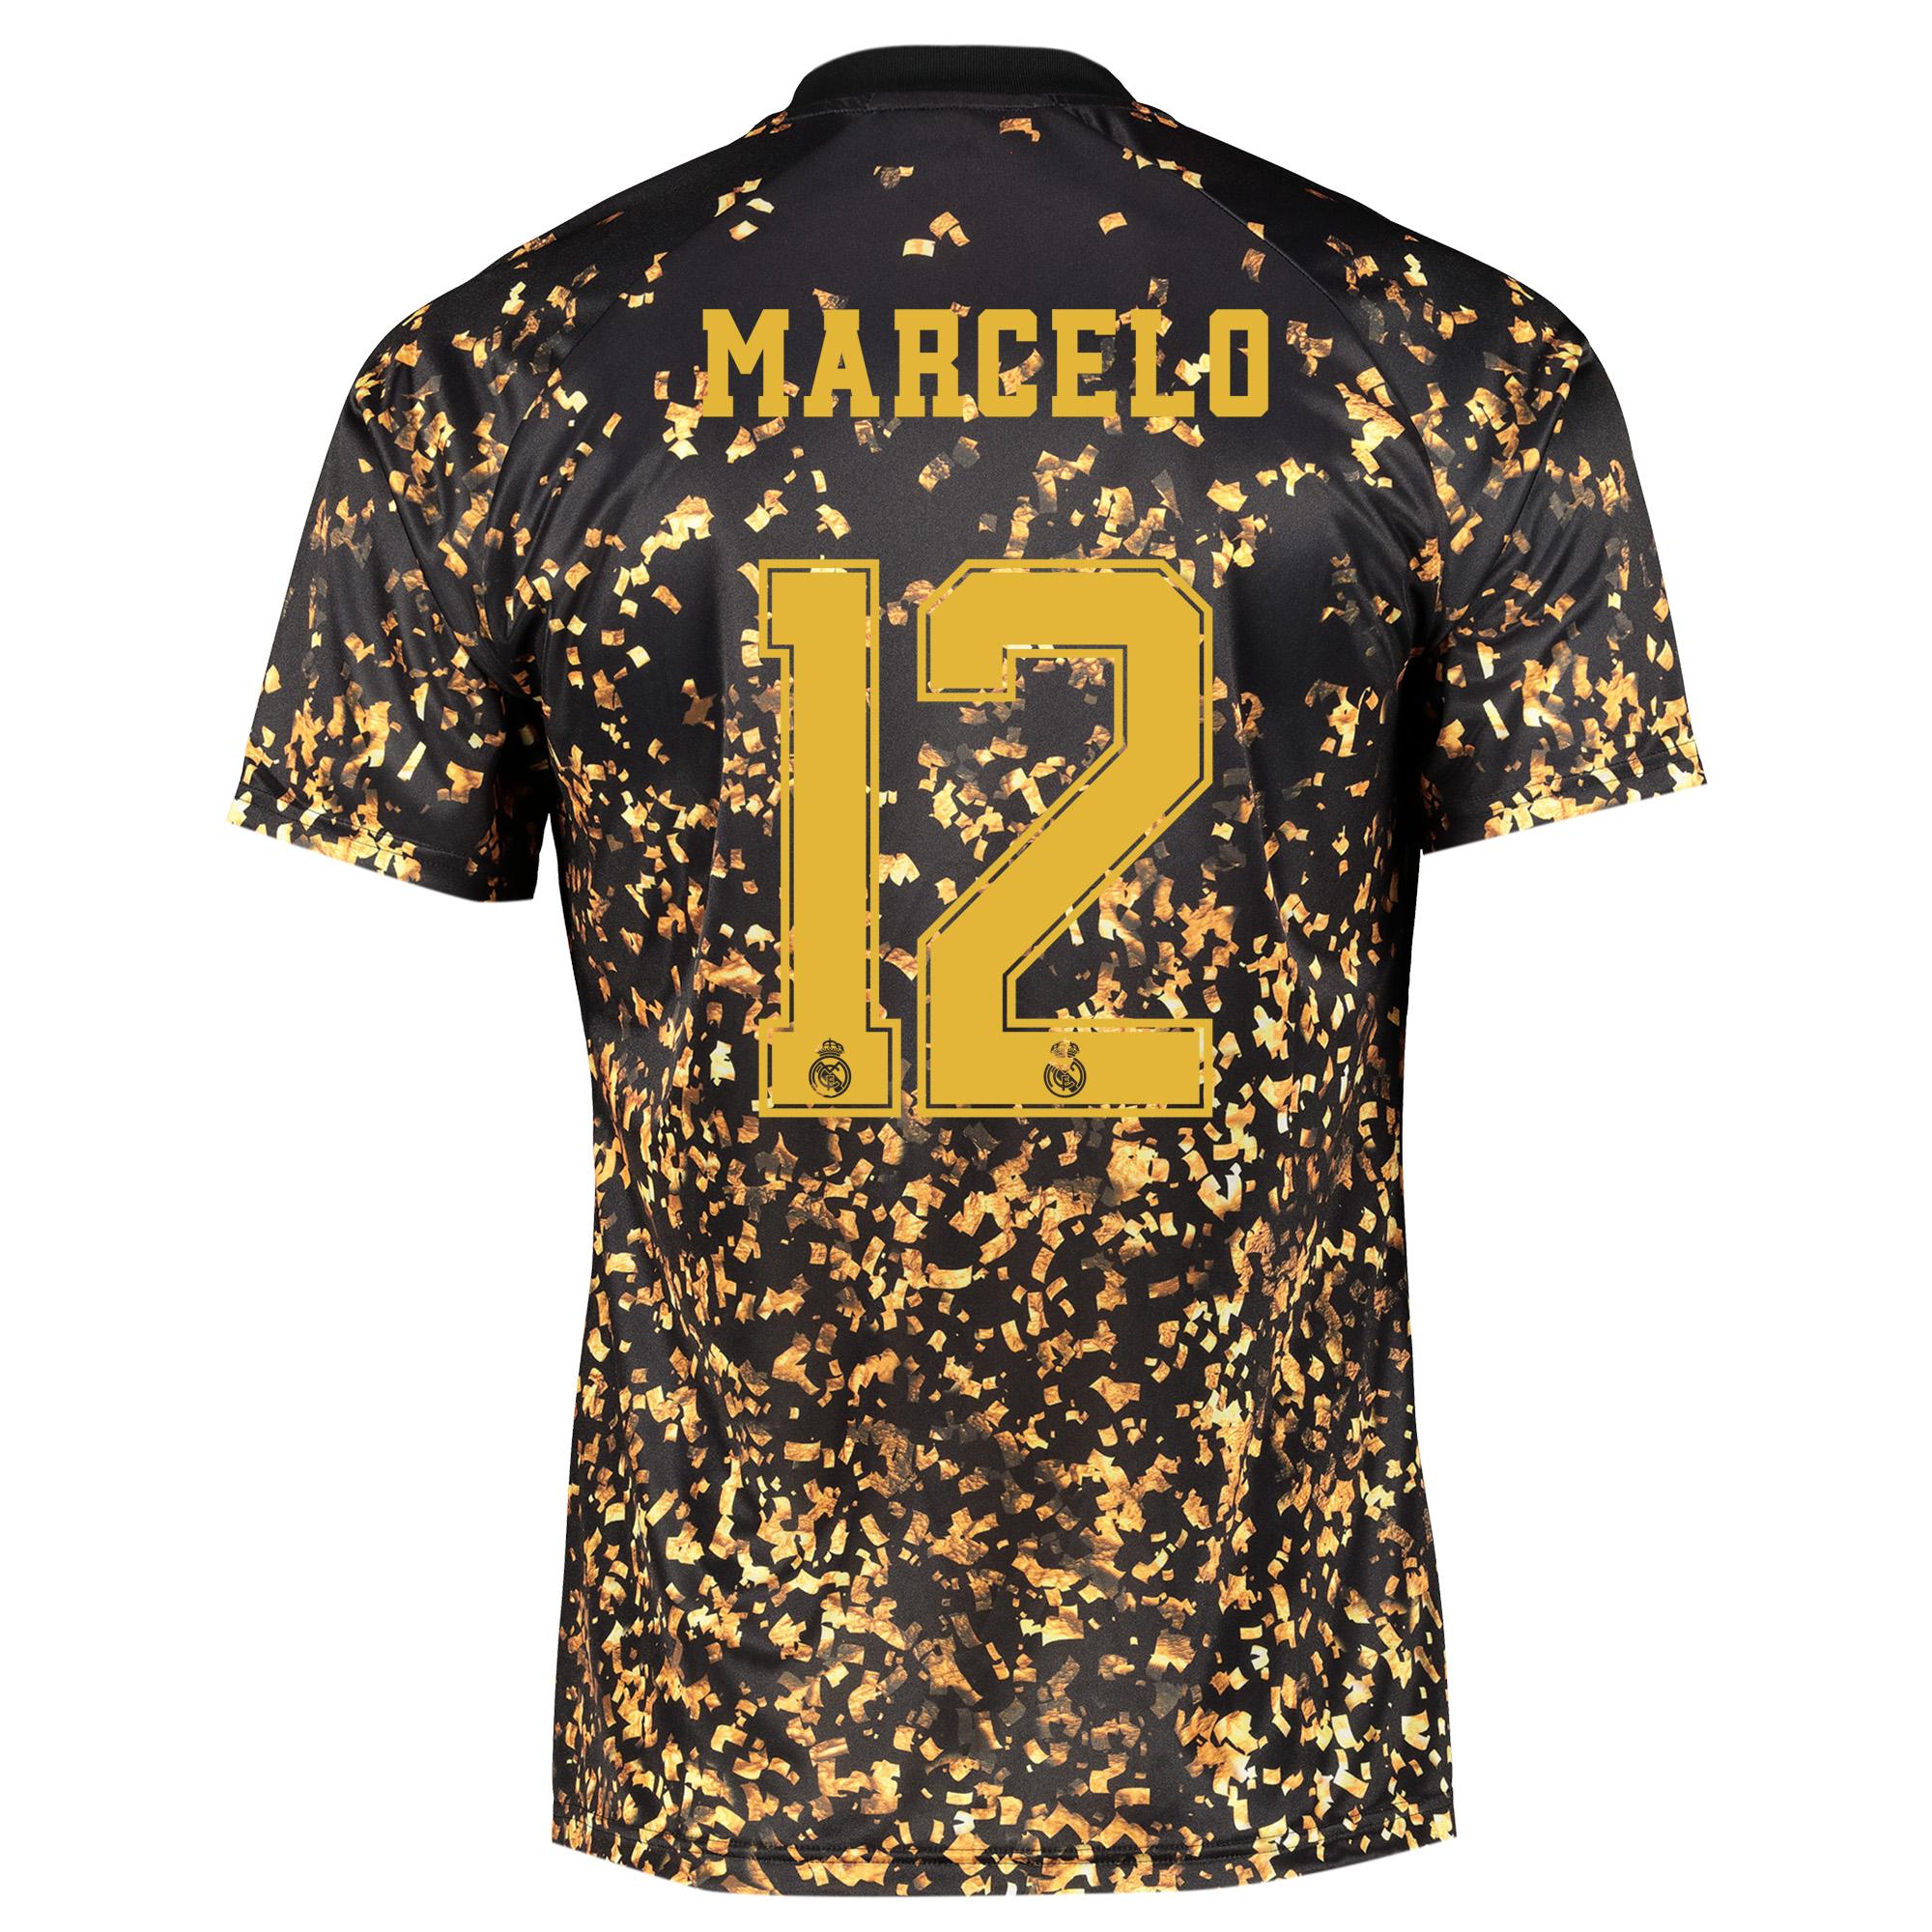 Camiseta adidas EA Sports del Real Madrid - Negro dorsal Marcelo 12